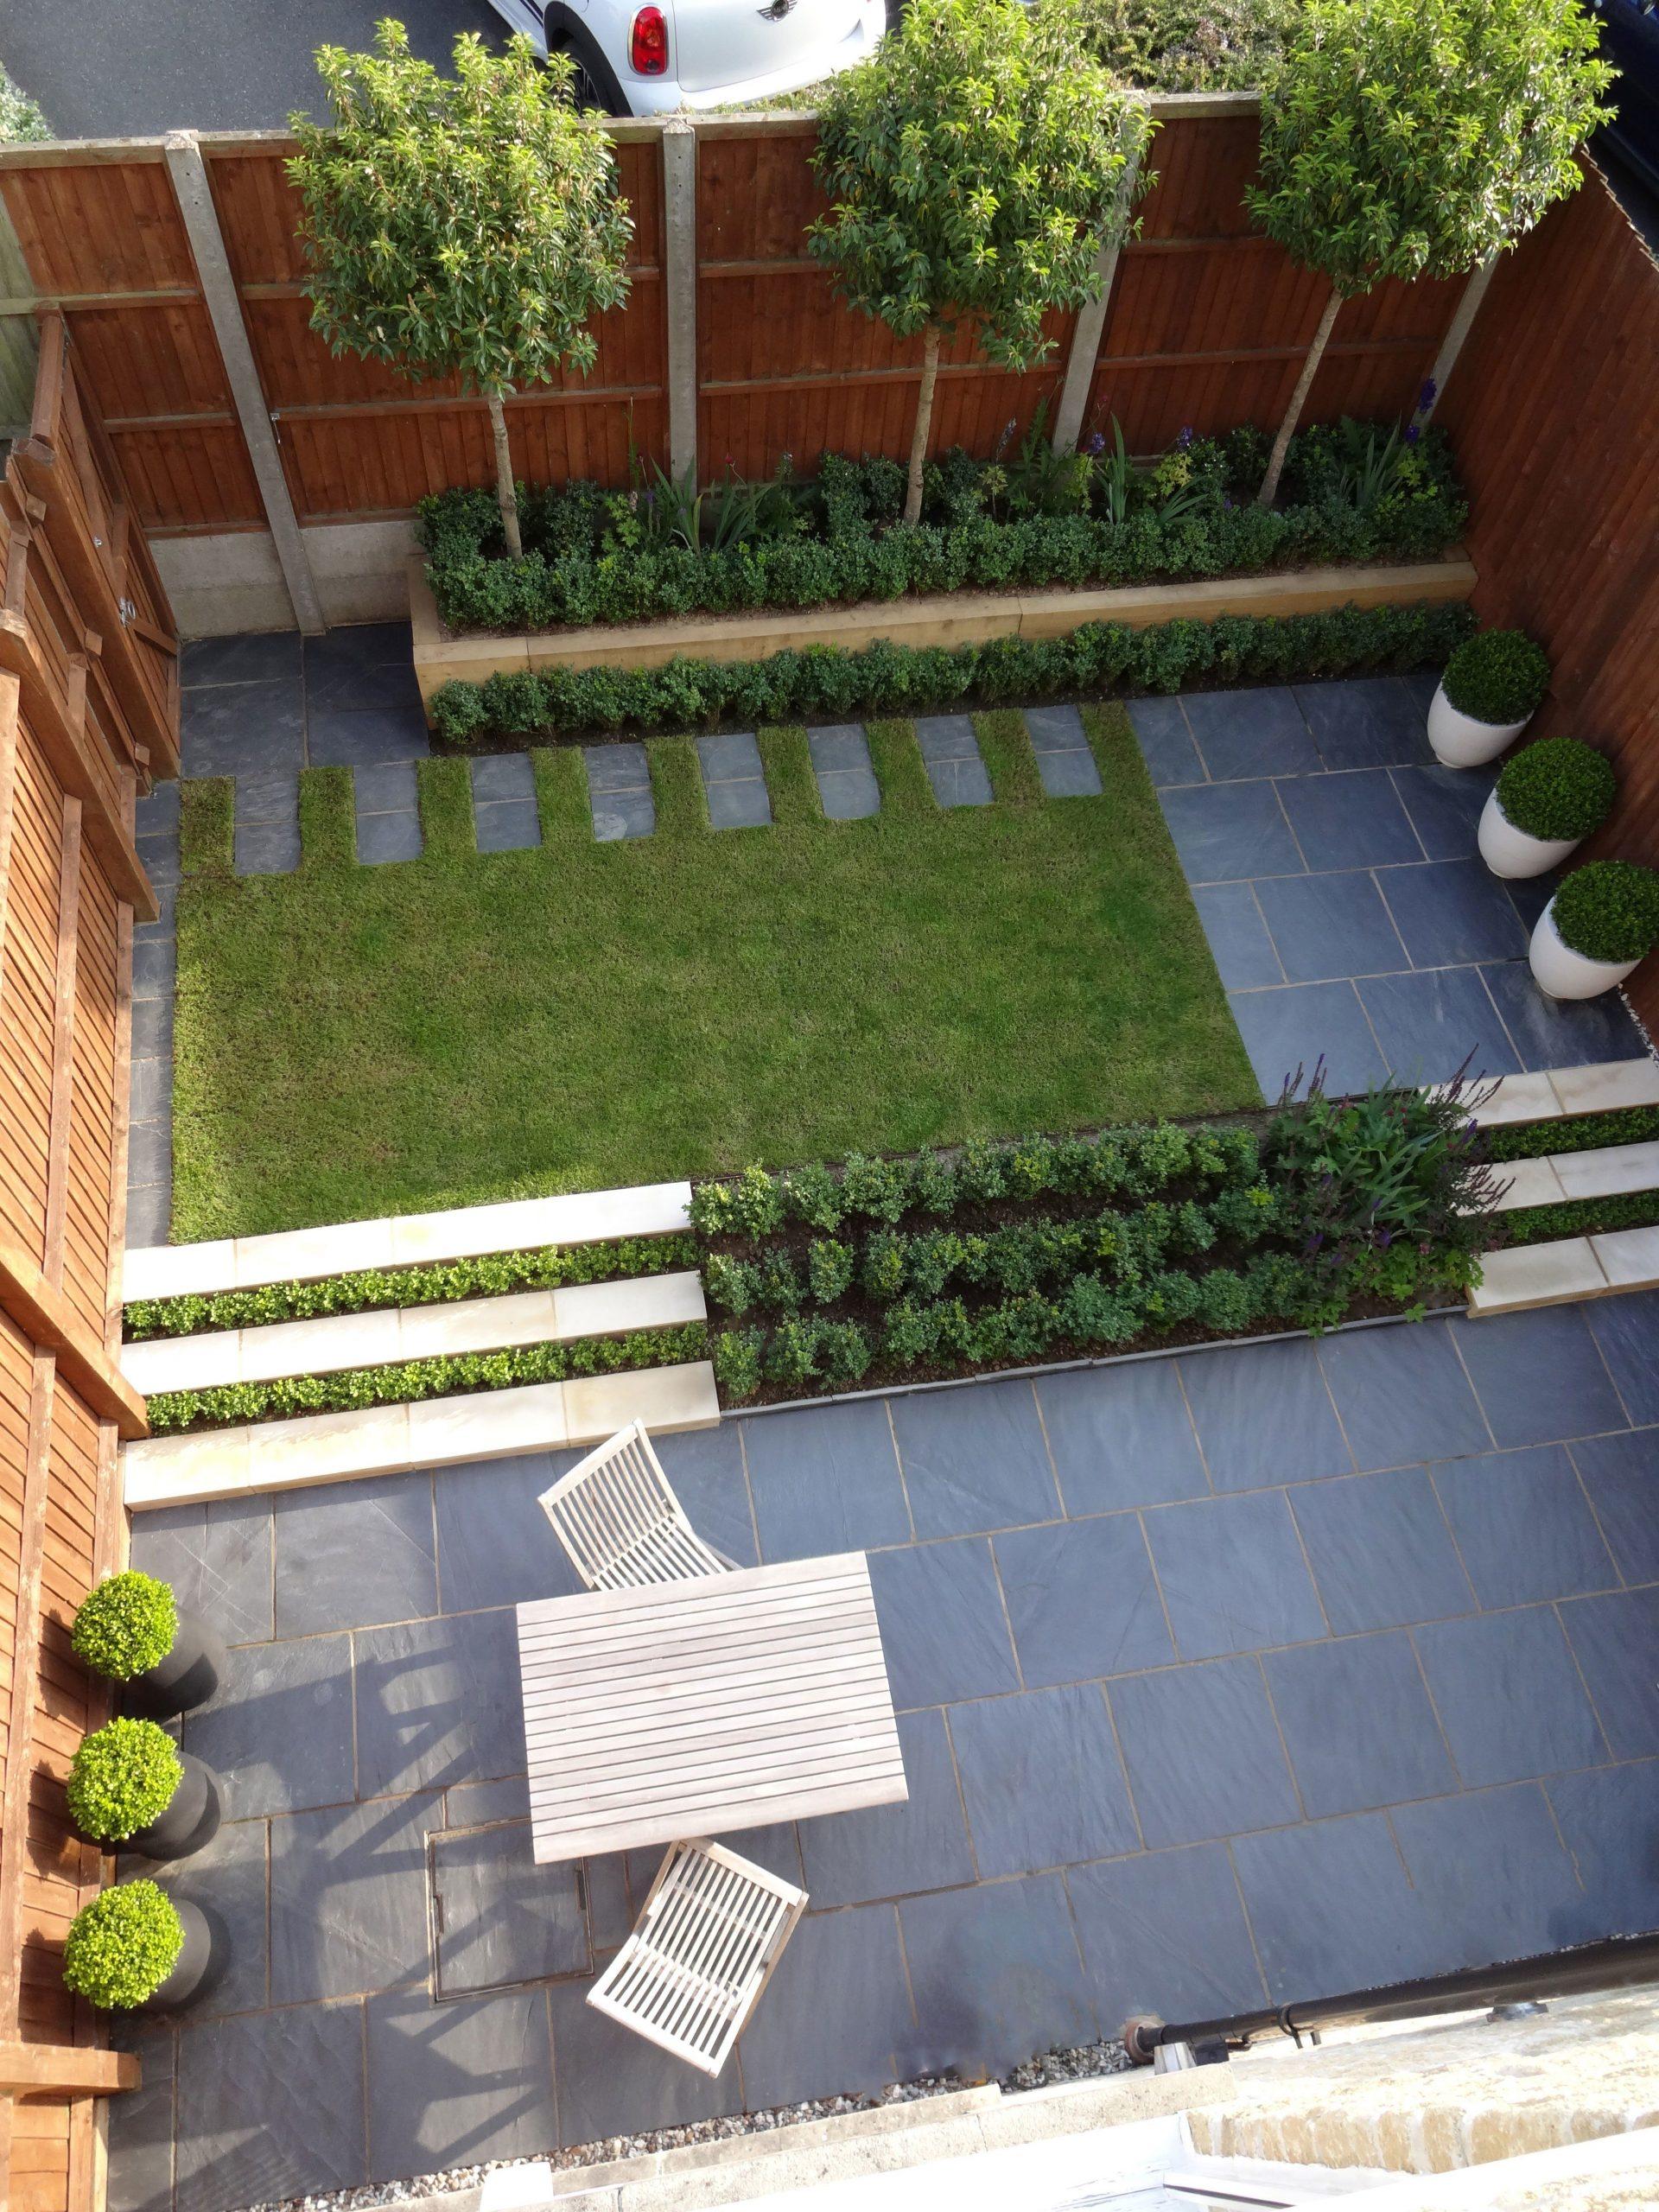 8 Cute Small Gardens And Outdoor Spaces | Petits Jardins ... destiné Idee Amenagement Jardin Zen